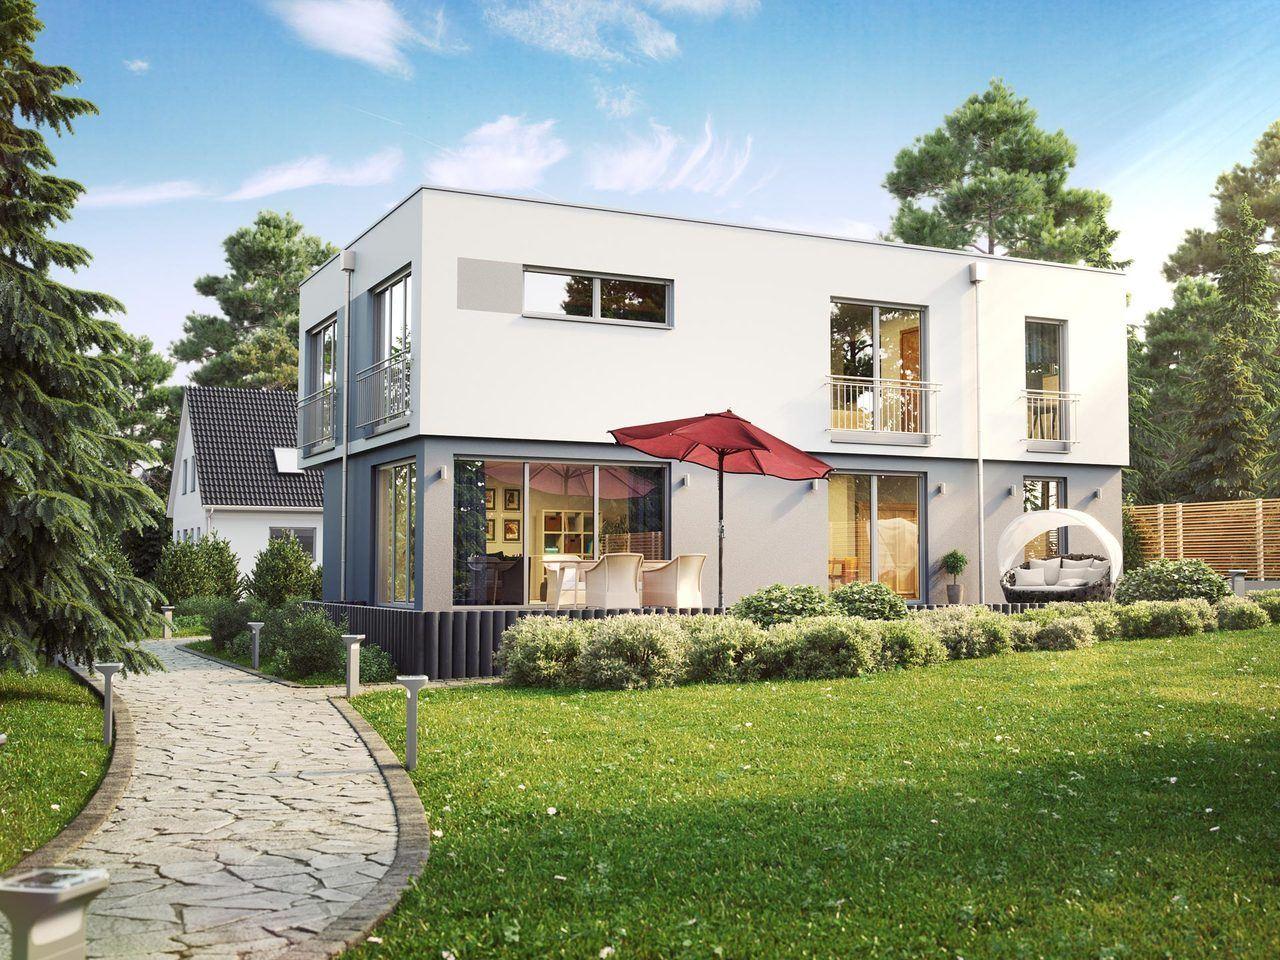 Haus Amsterdam Bauhaus - Dürr Massivhaus